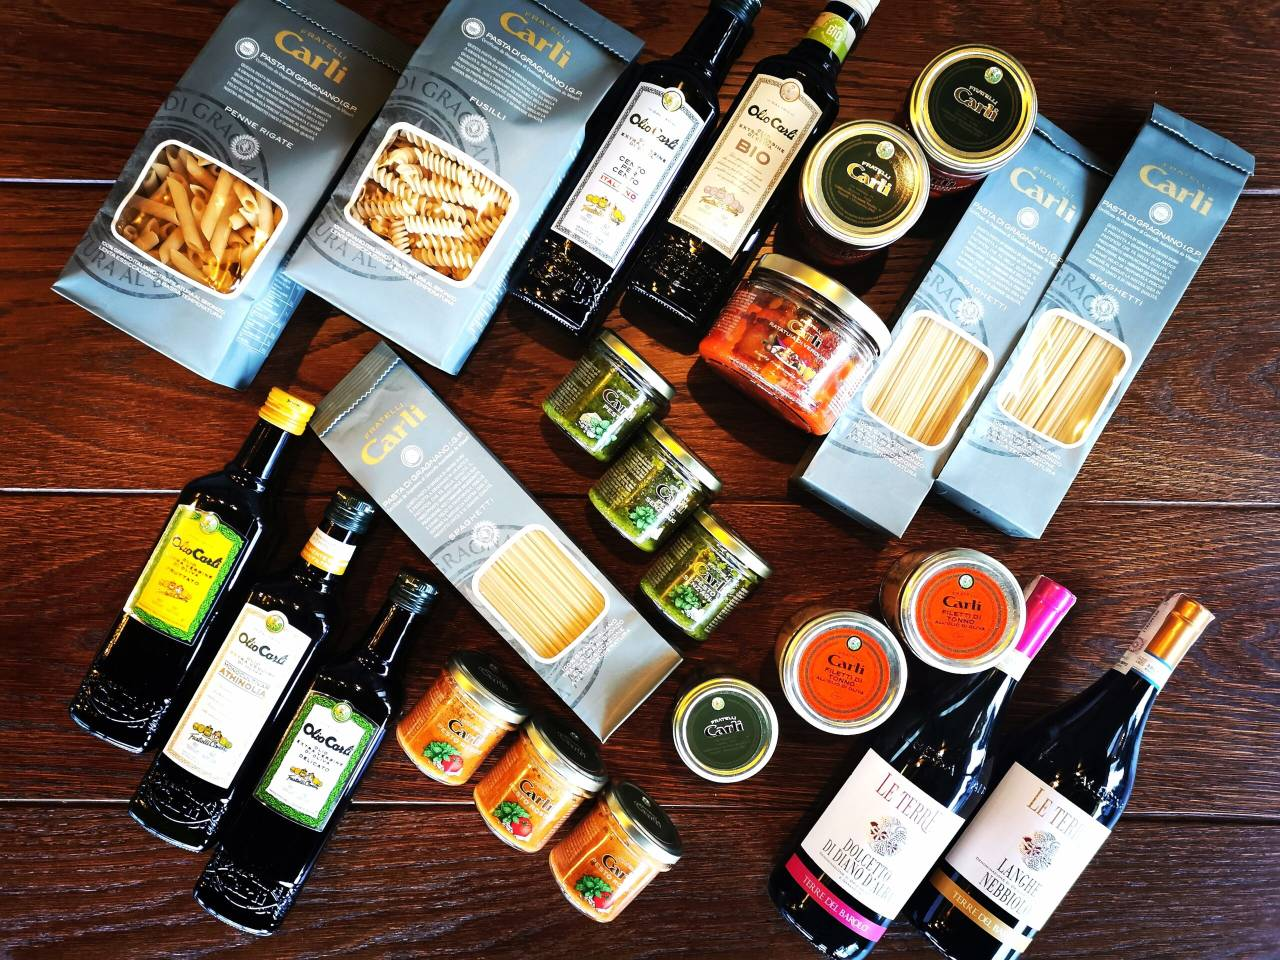 Wielka rodzina w imię wina - Terre del Barolo